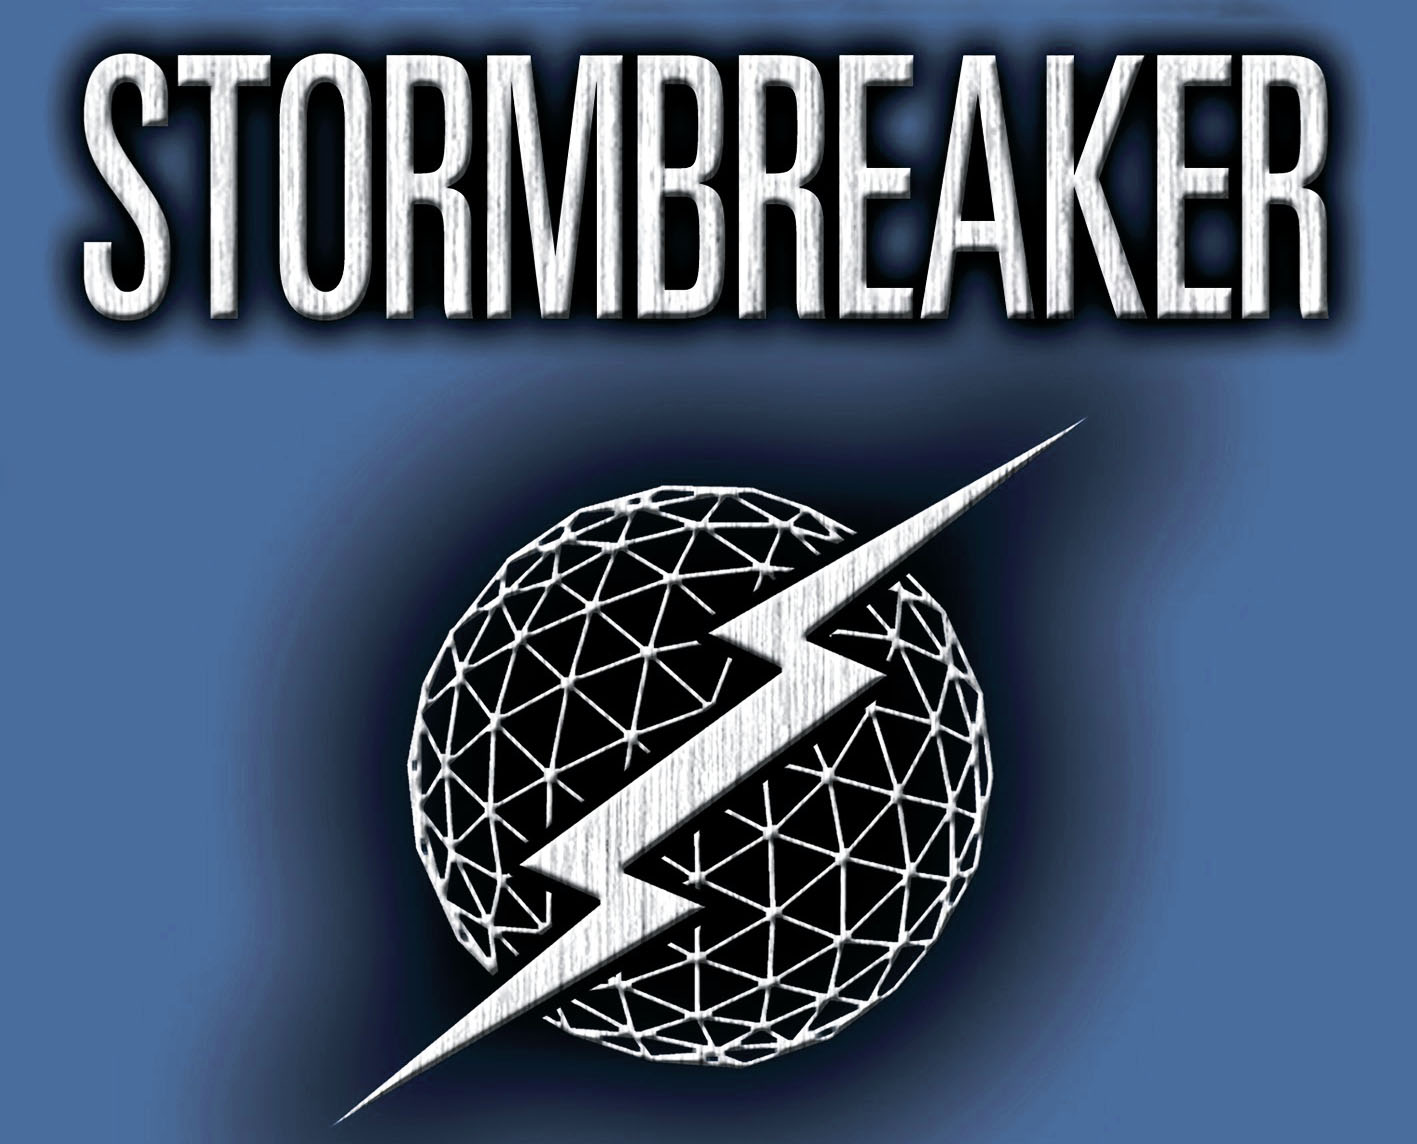 Stormbreaker Anthony Horowitz Alex Rider